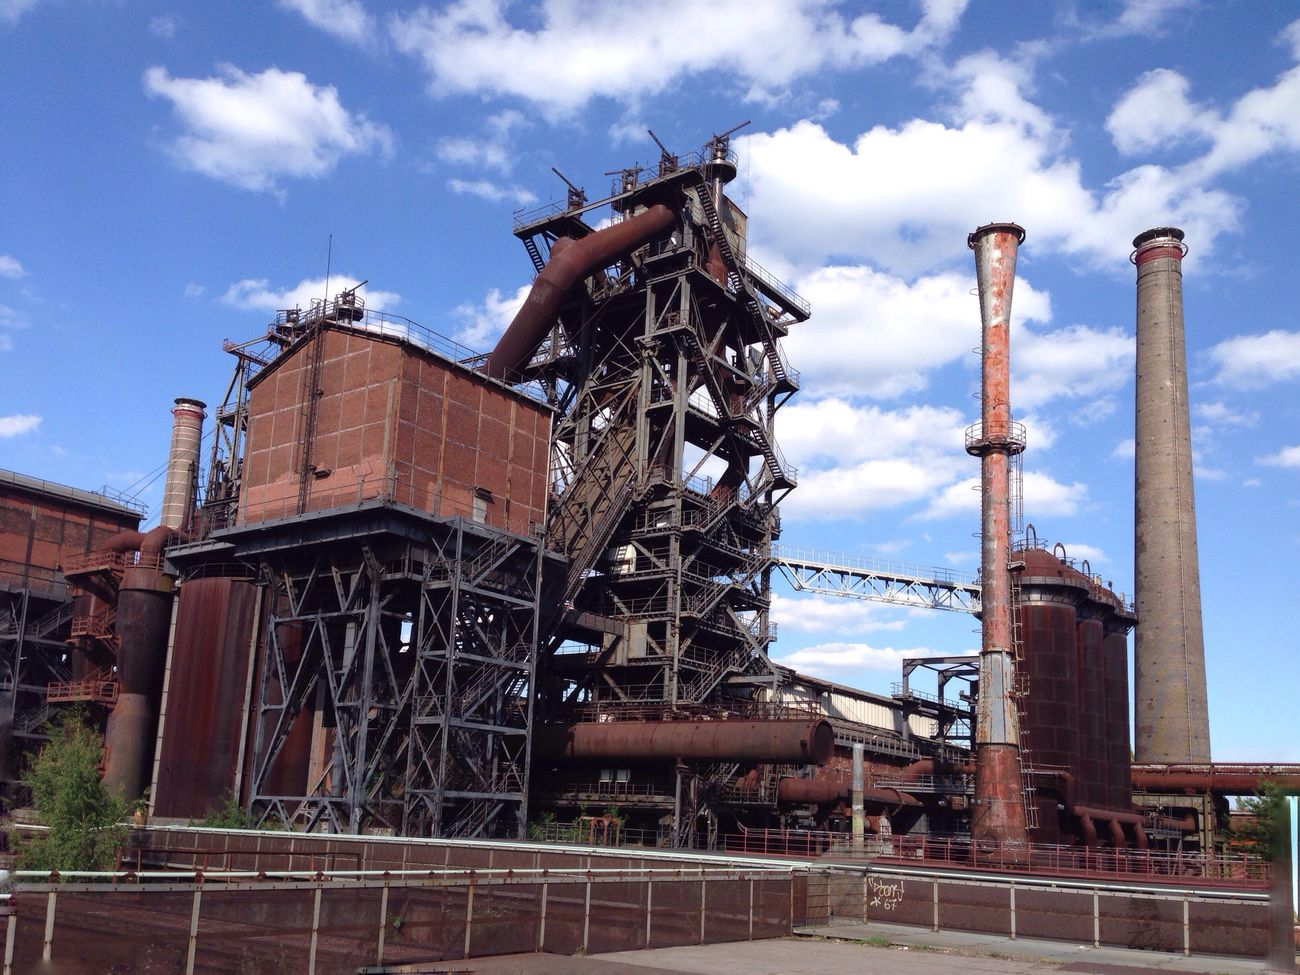 Landschaftspark Duisburg-nord Industry Industry Factory Cloud - Sky Day Built Structure Outdoors